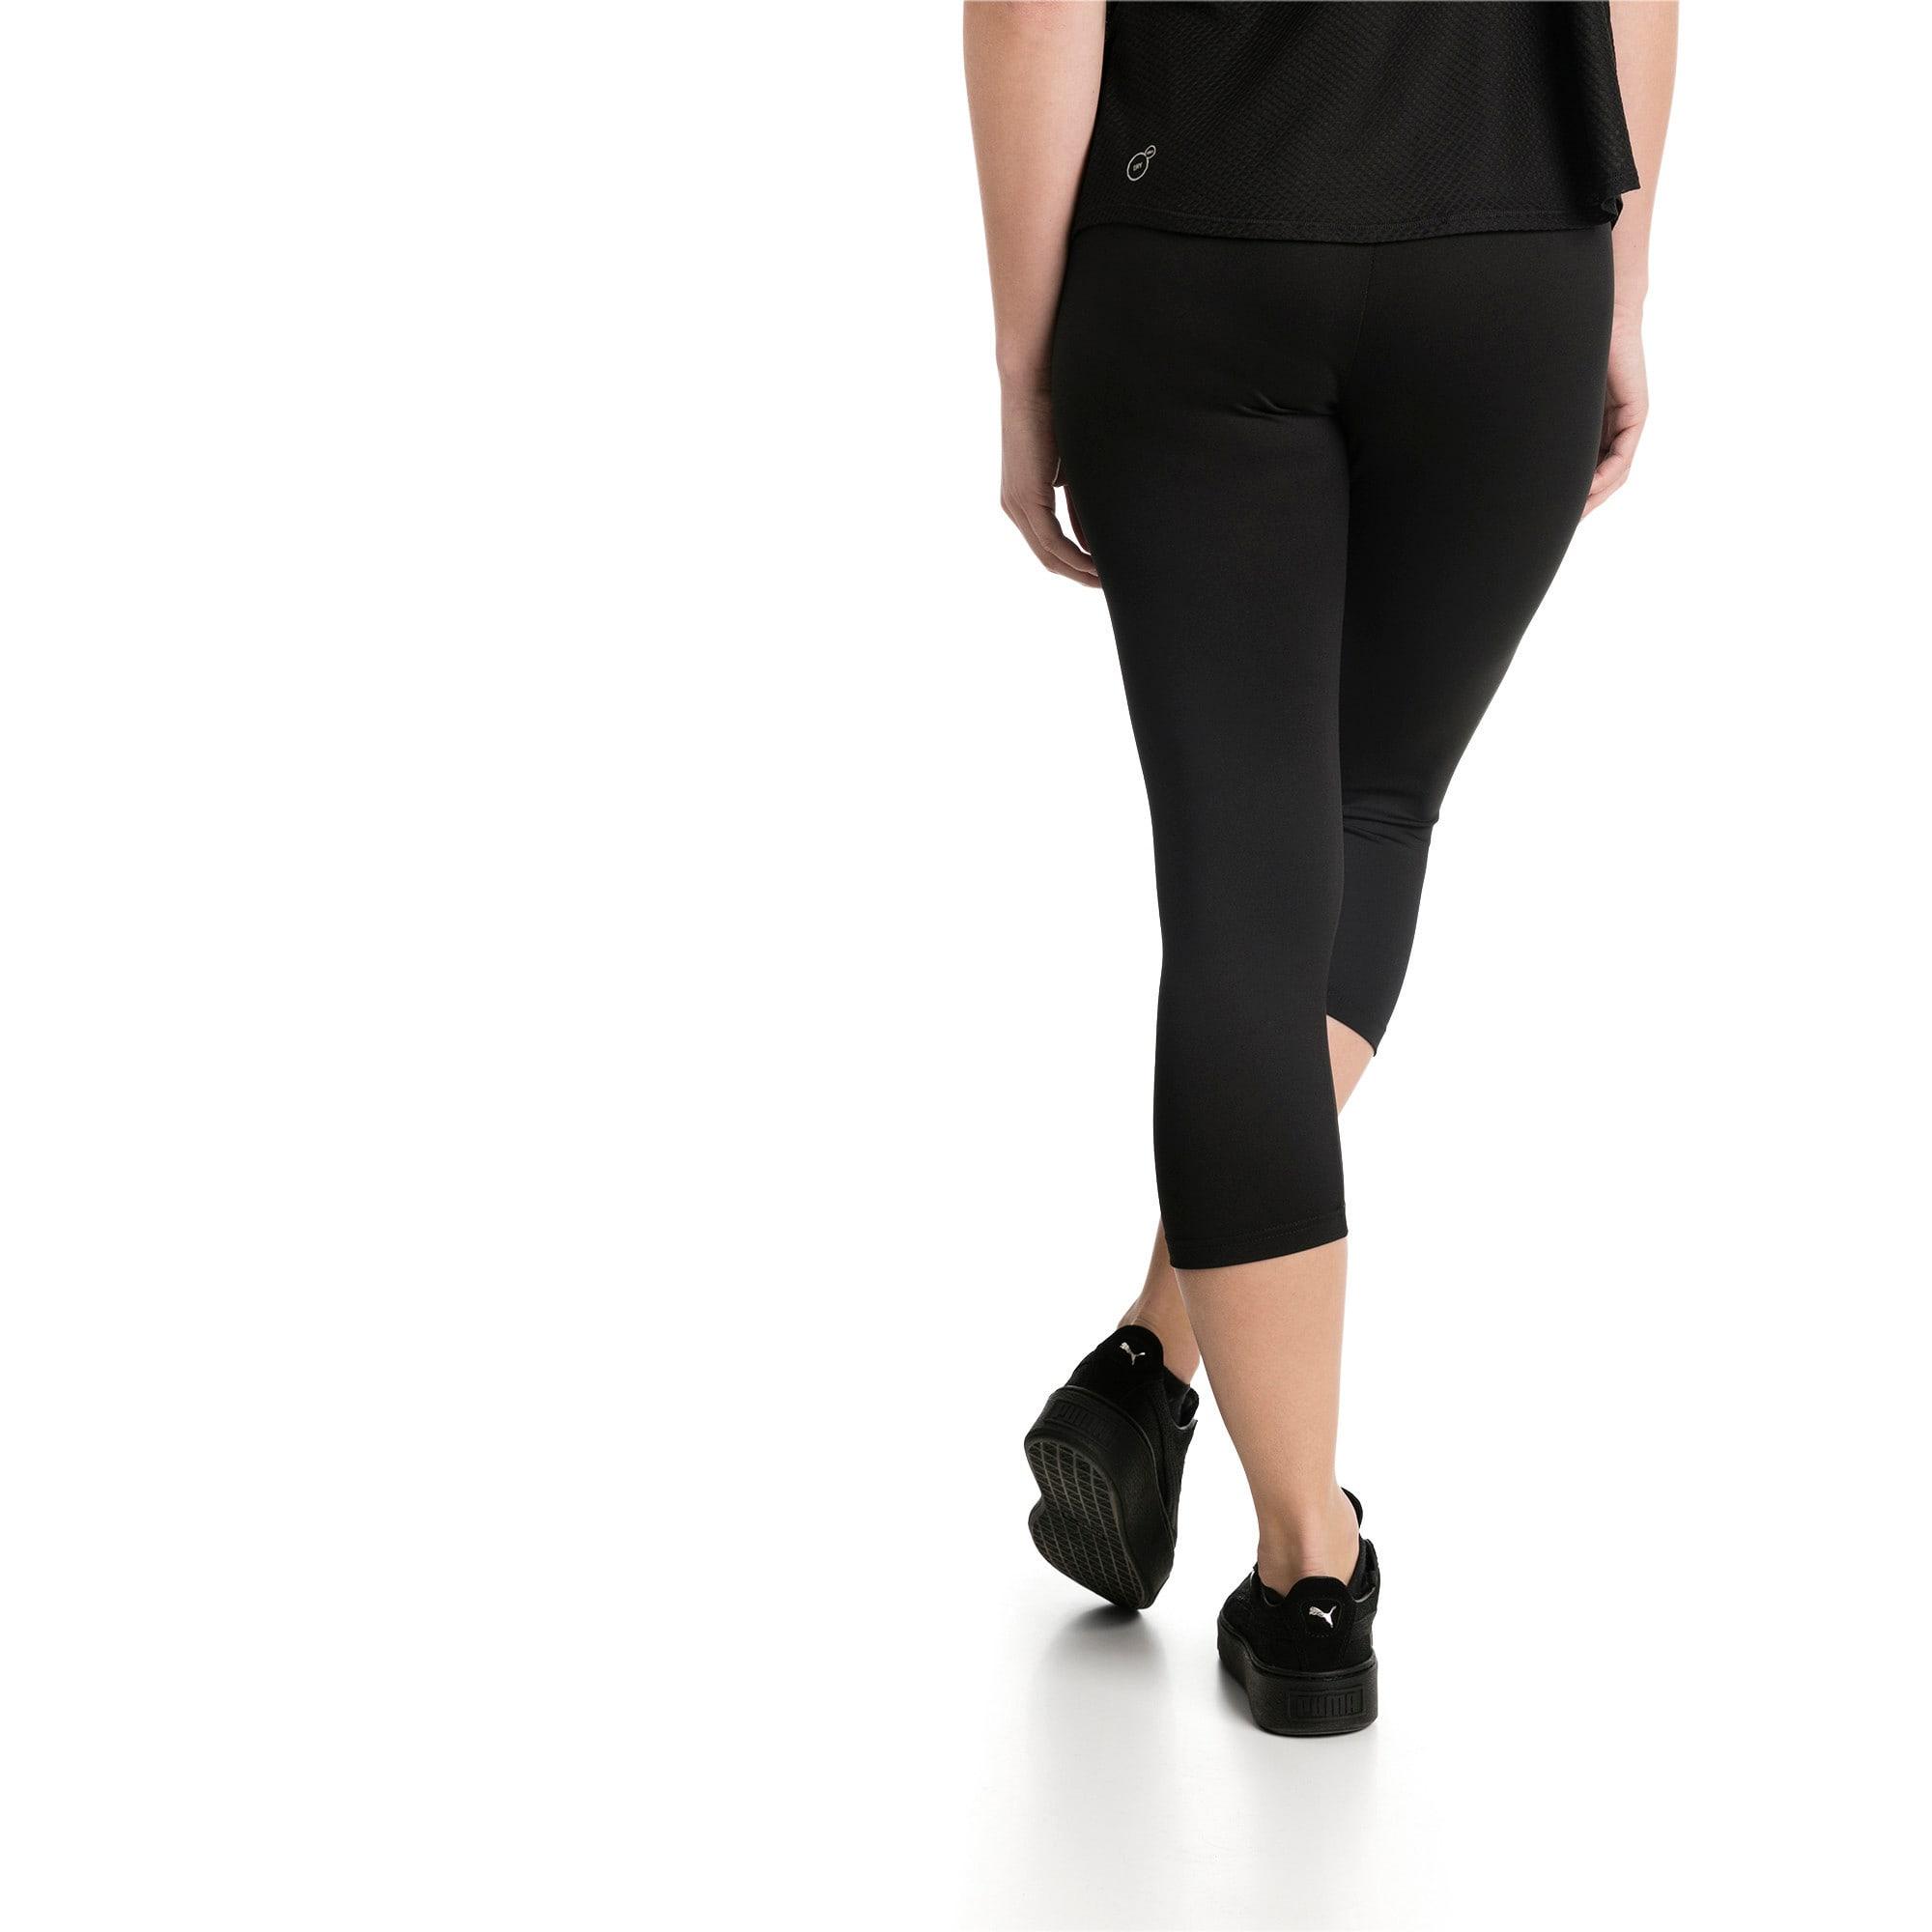 Thumbnail 2 of Active Women's 3/4 Leggings, Puma Black, medium-IND